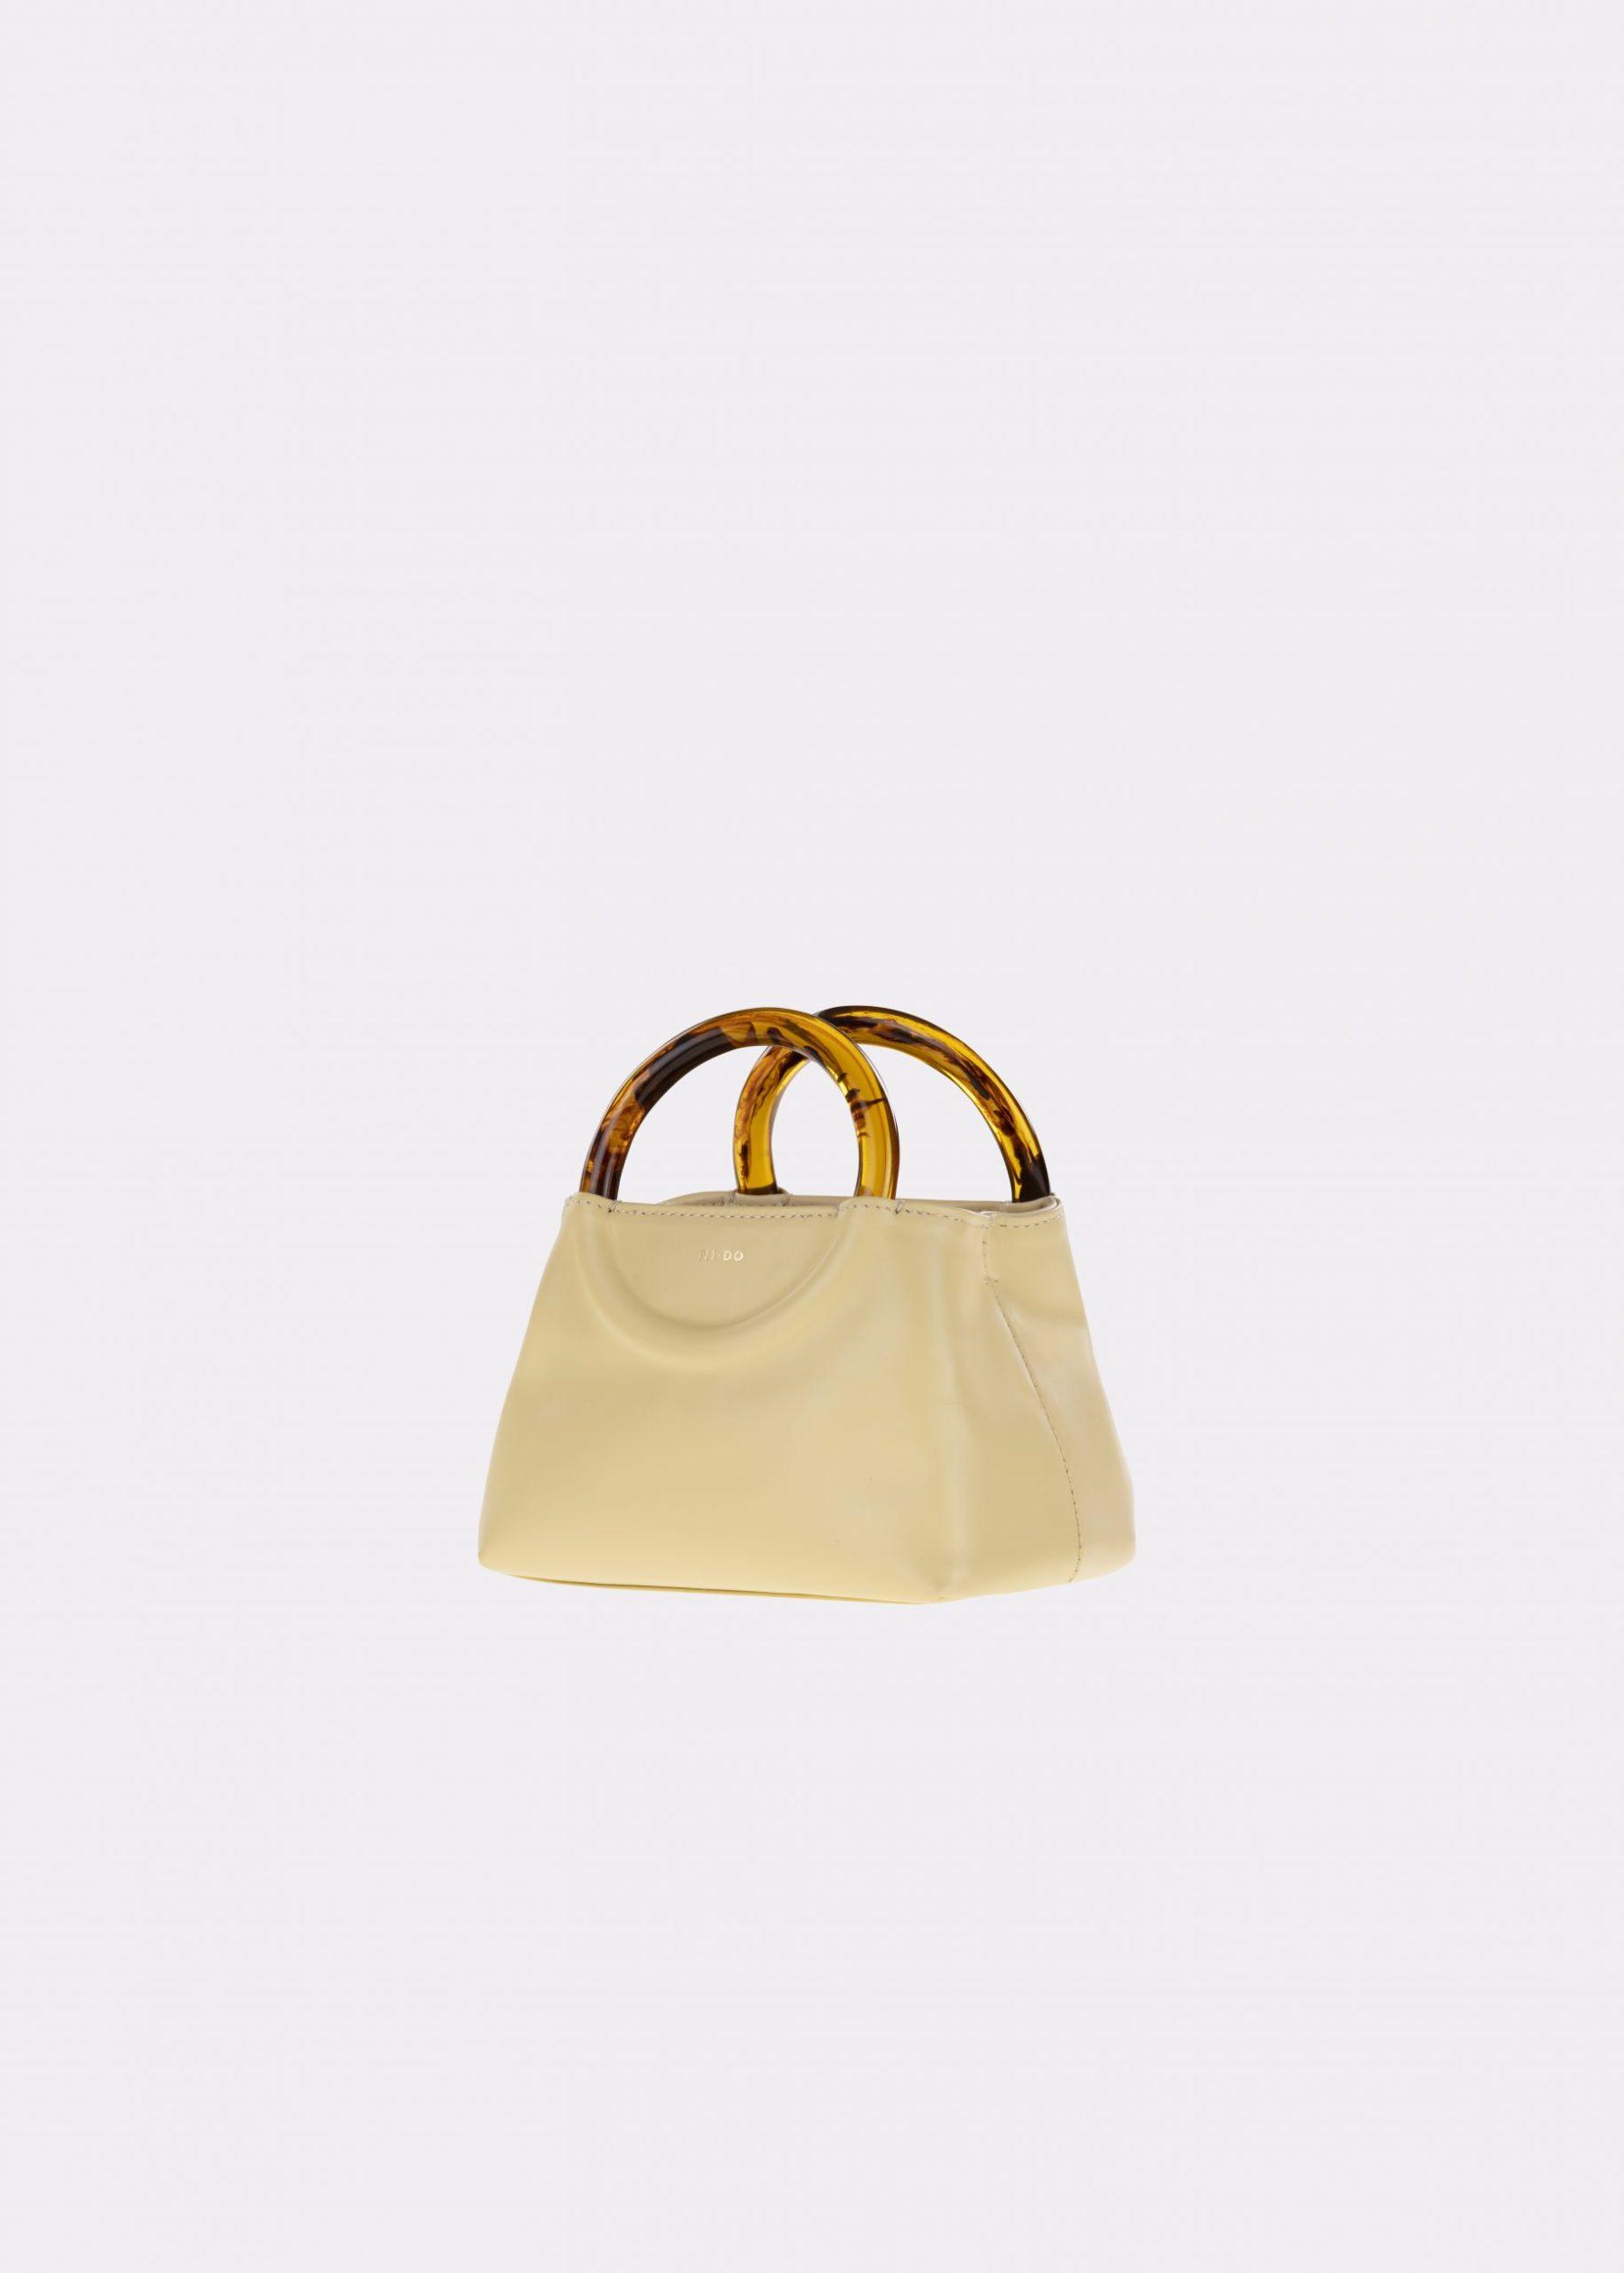 NIDO-Bolla_Micro-bag-lemontart-Amber_side view